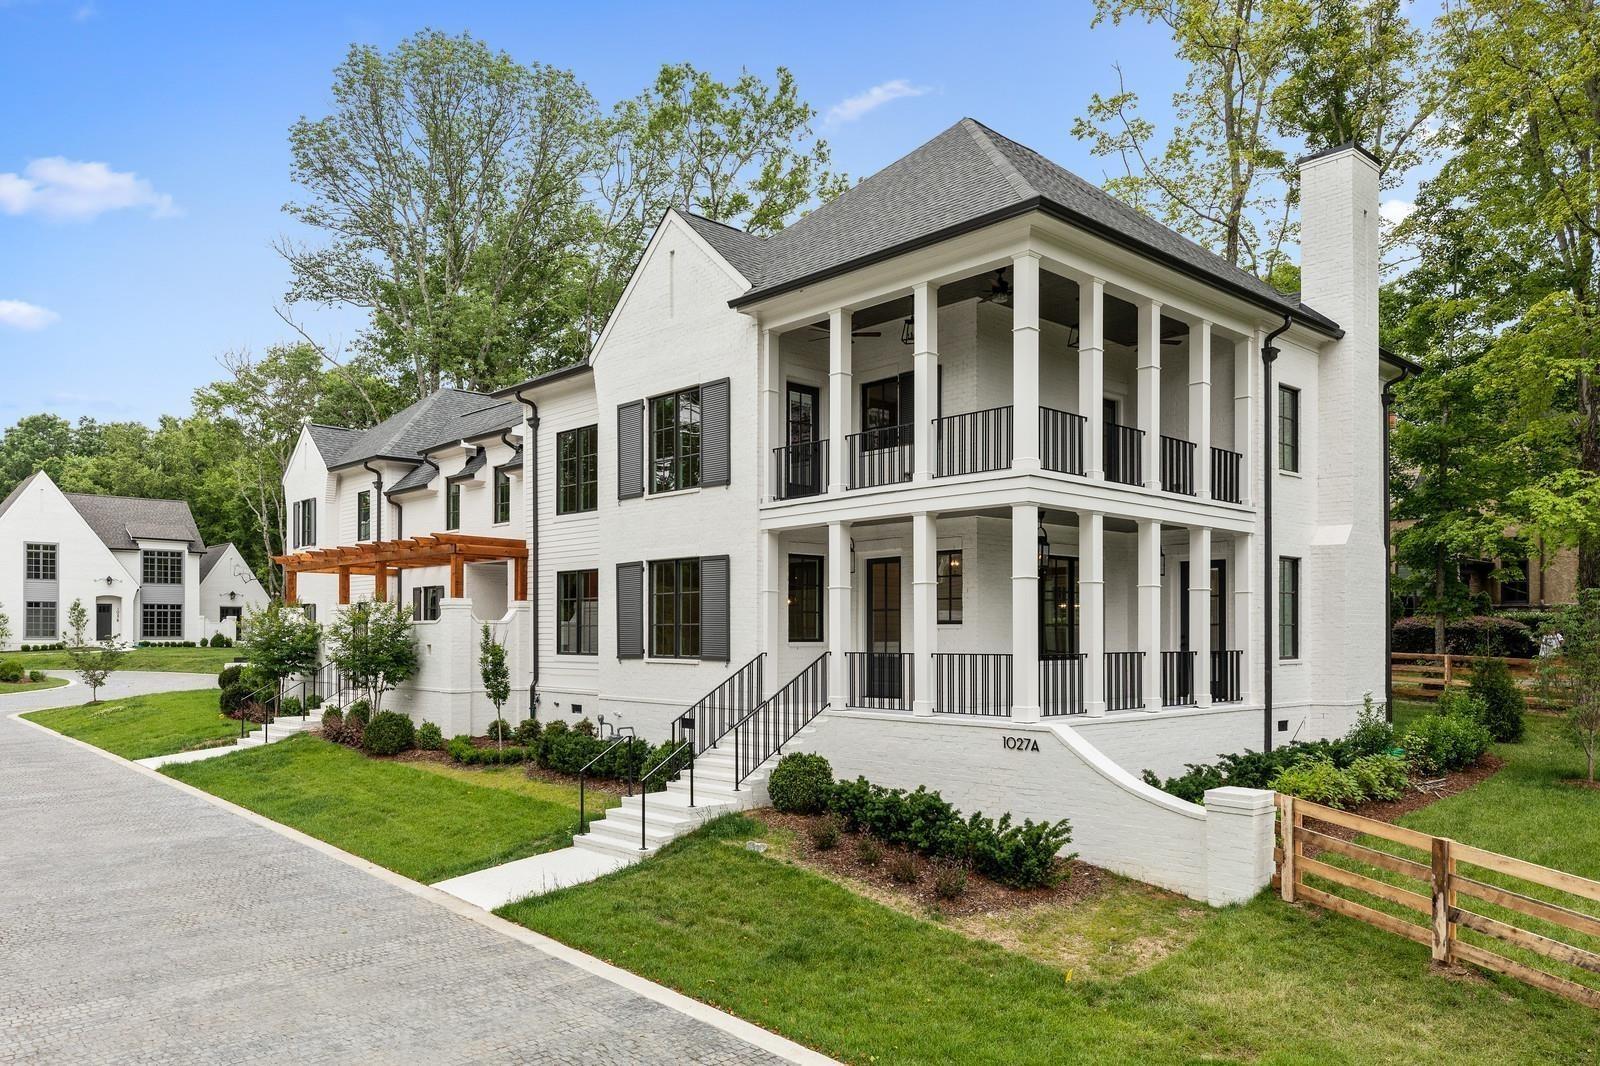 1027A Battery Lane, Nashville, TN 37220 - Nashville, TN real estate listing